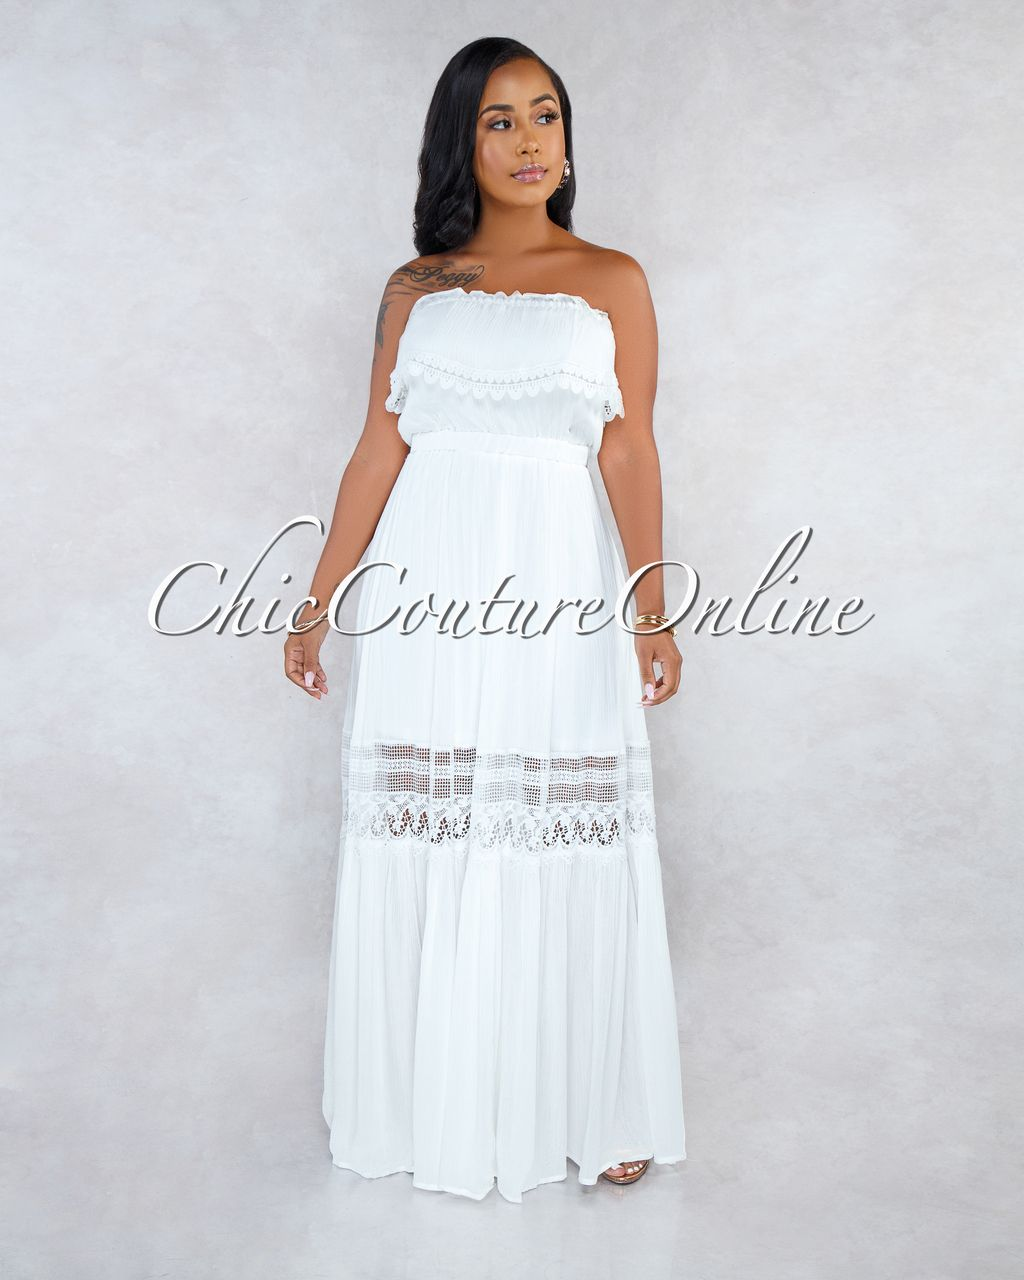 5e3c3a32a3d Chic Couture Online - Arden Ivory Off-The-Shoulder Crochet Maxi Dress